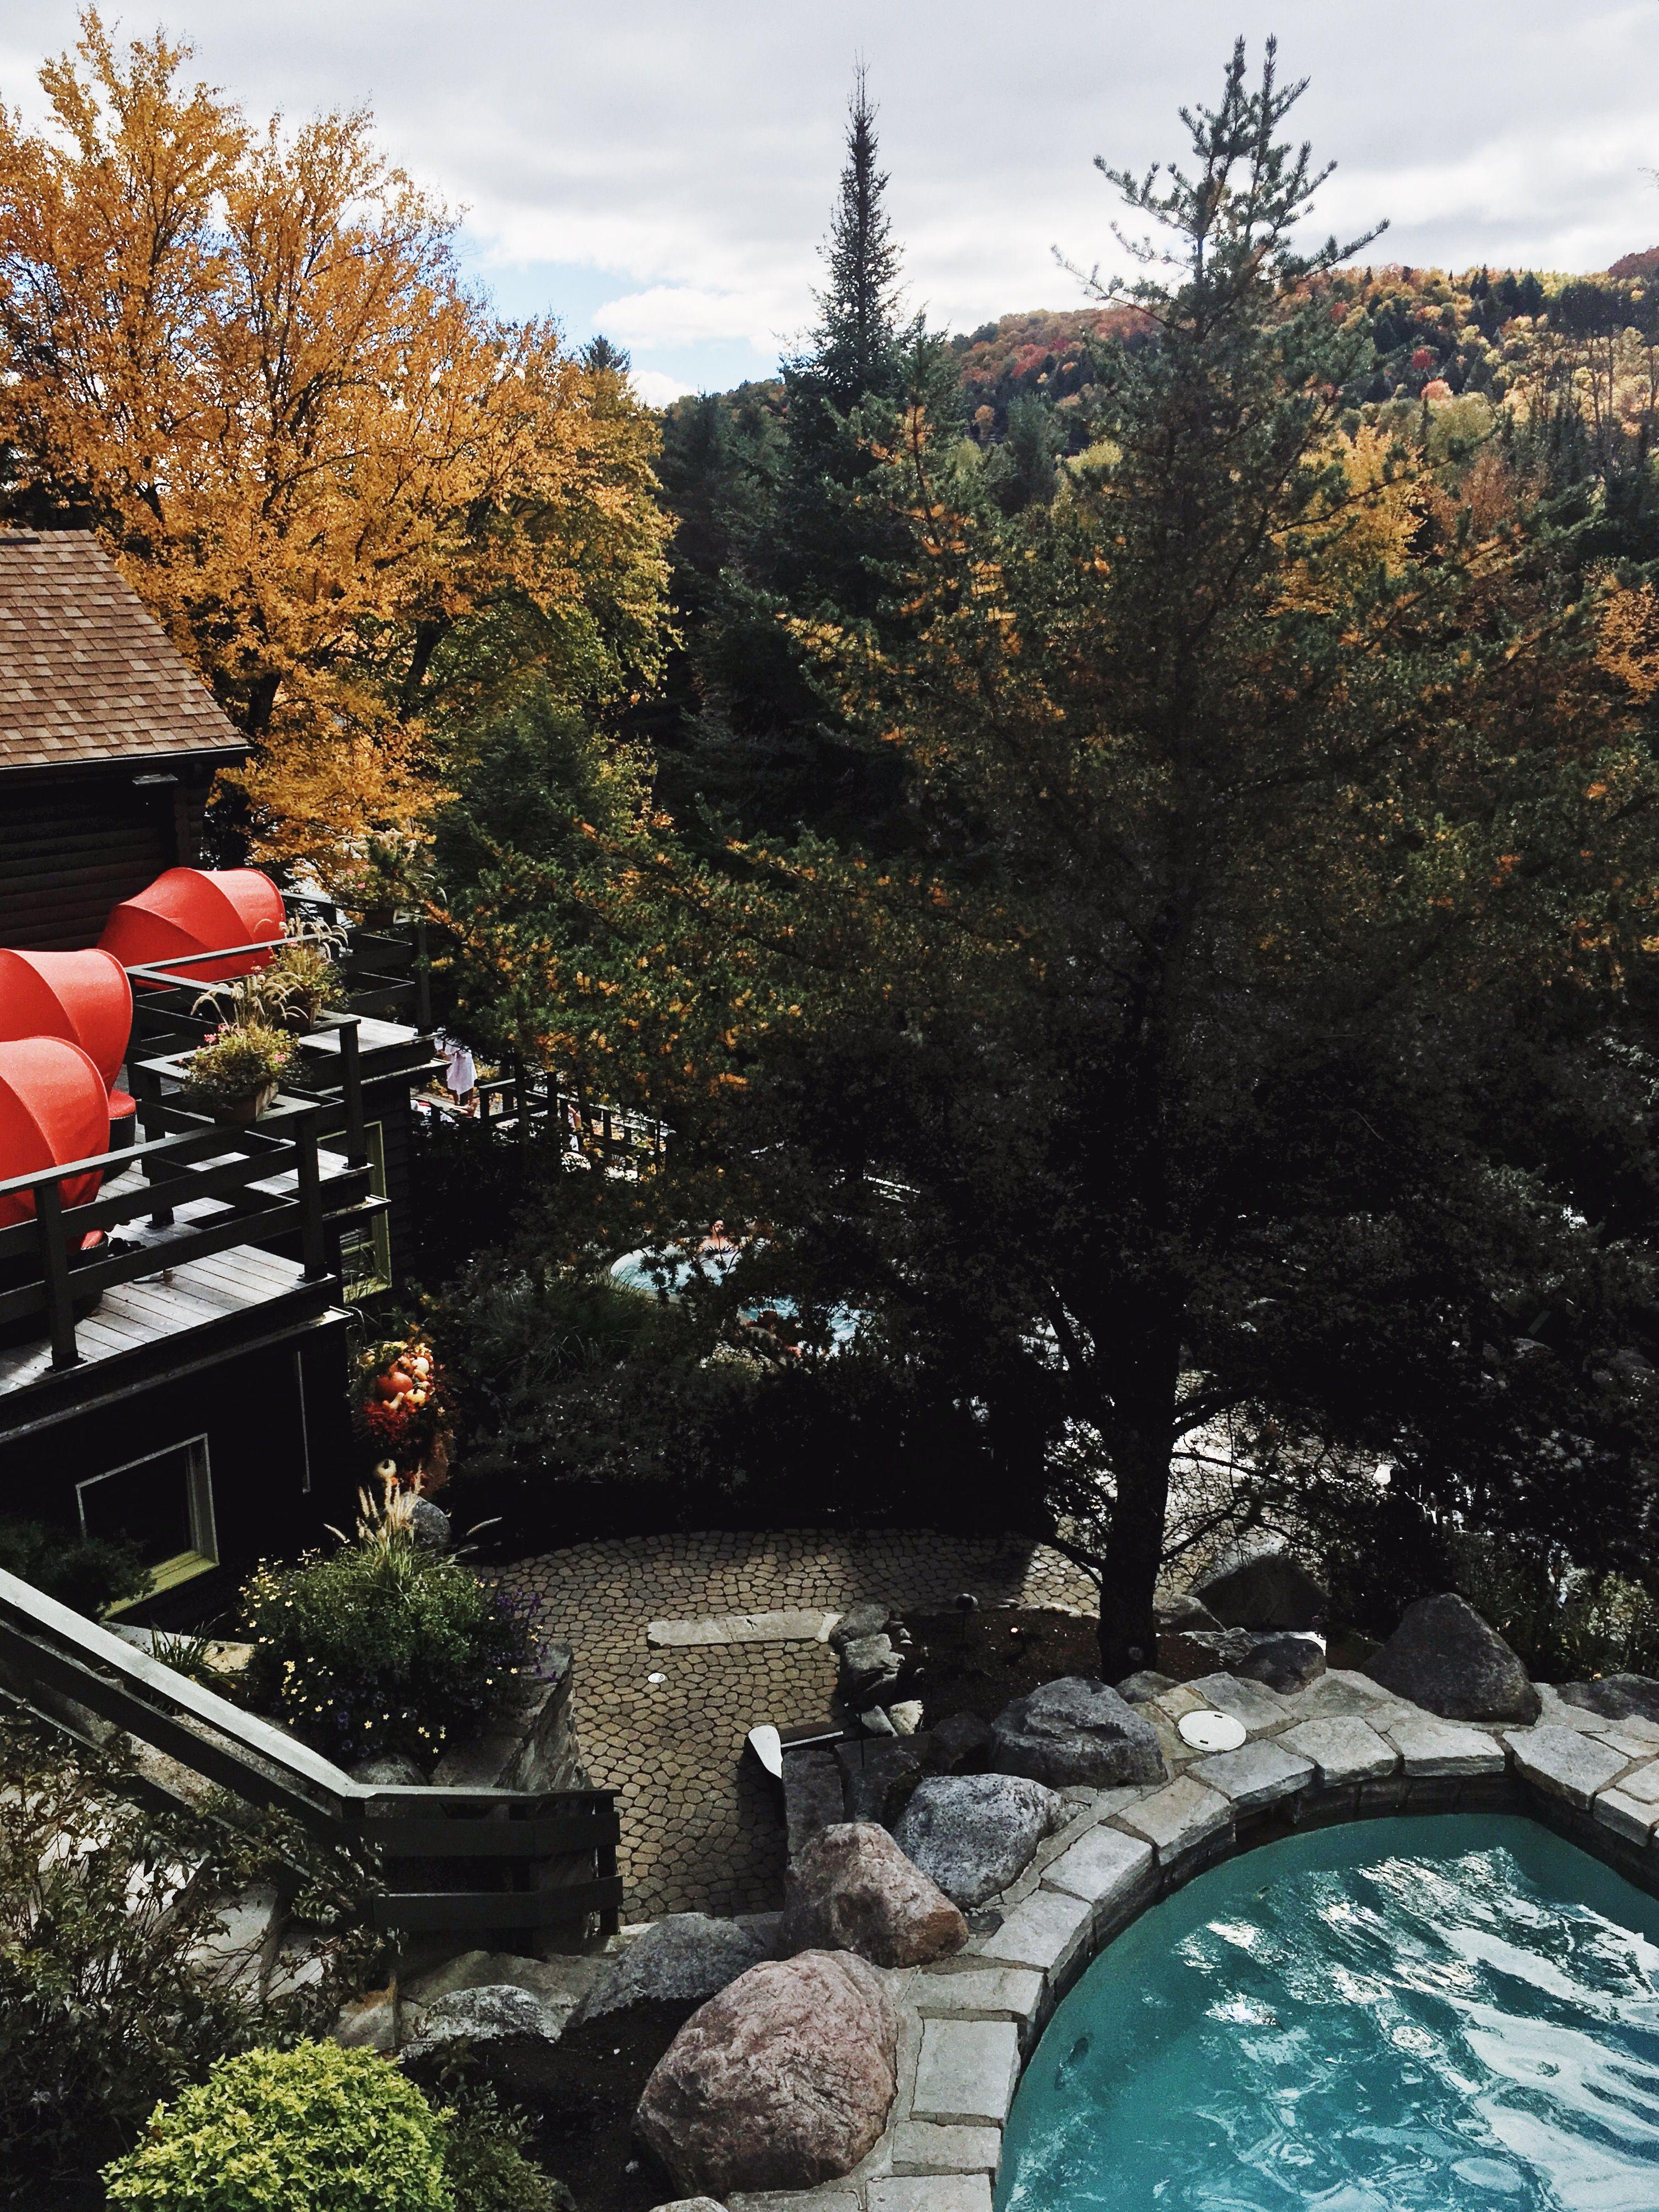 Scandinavian Spa Nordic Baths Mont Tremblant Thermal Pool Spa